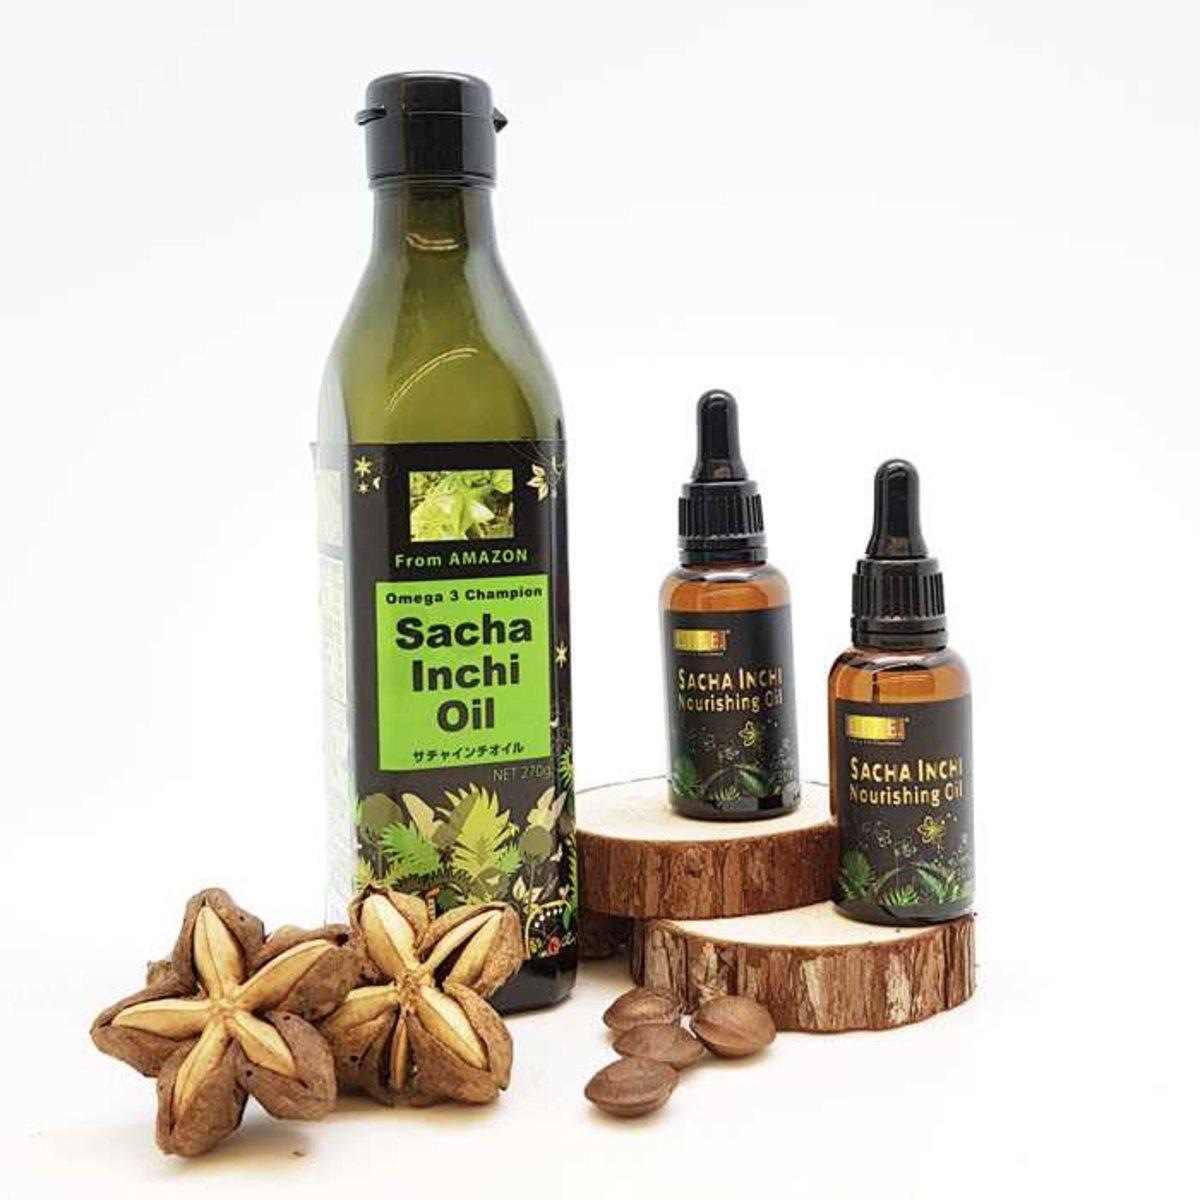 Organic Sacha Inchi Oil Package (270g x1; 30ml x 2)